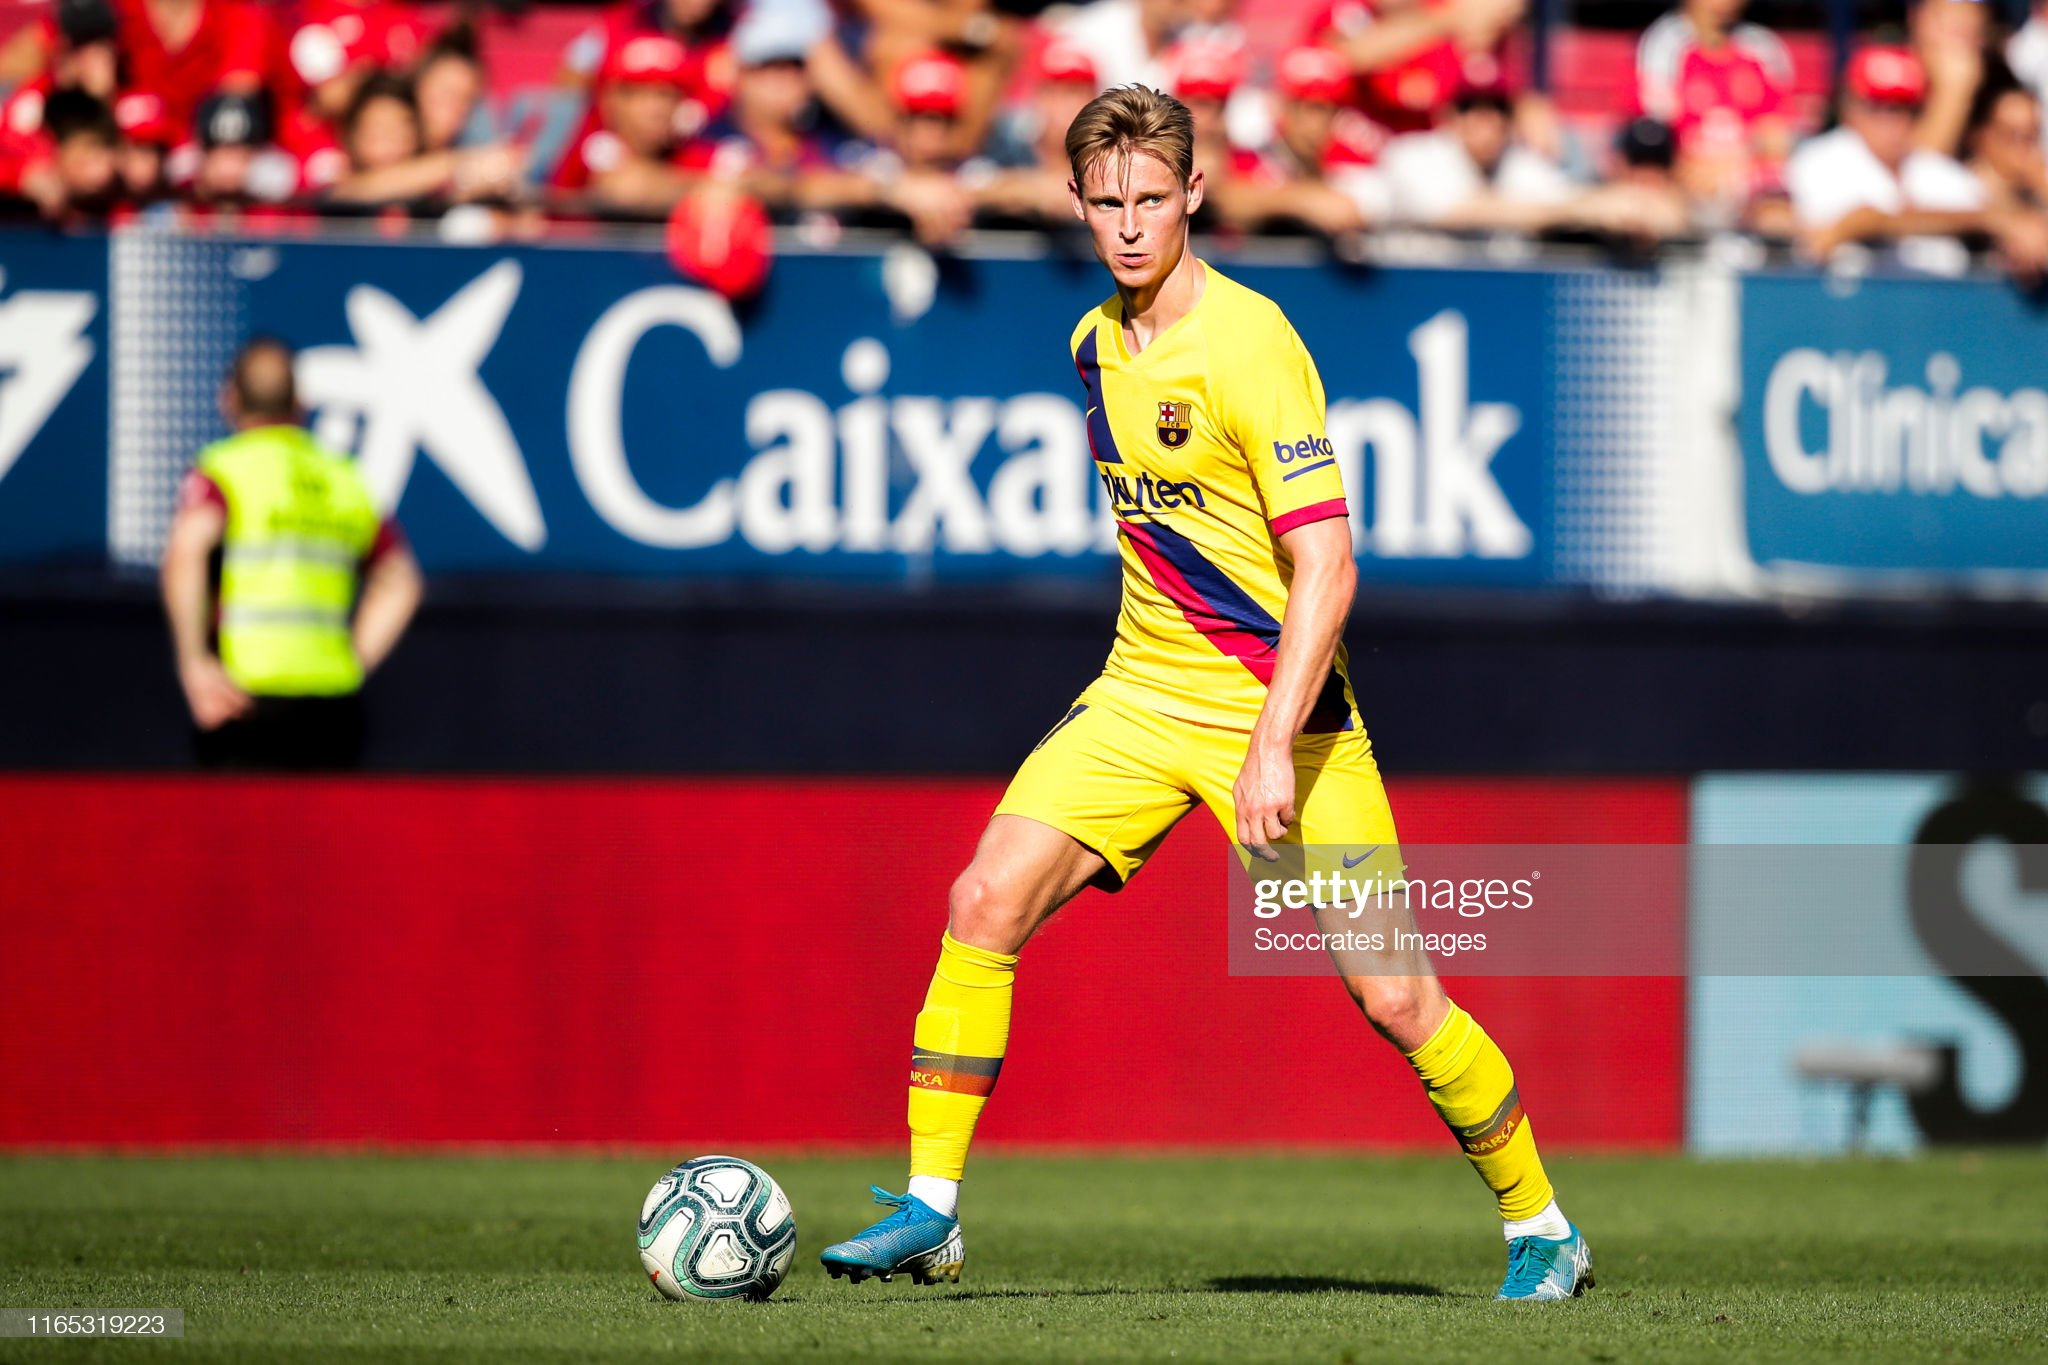 صور مباراة : أوساسونا - برشلونة 2-2 ( 31-08-2019 )  Frenkie-de-jong-of-fc-barcelona-during-the-la-liga-santander-match-picture-id1165319223?s=2048x2048